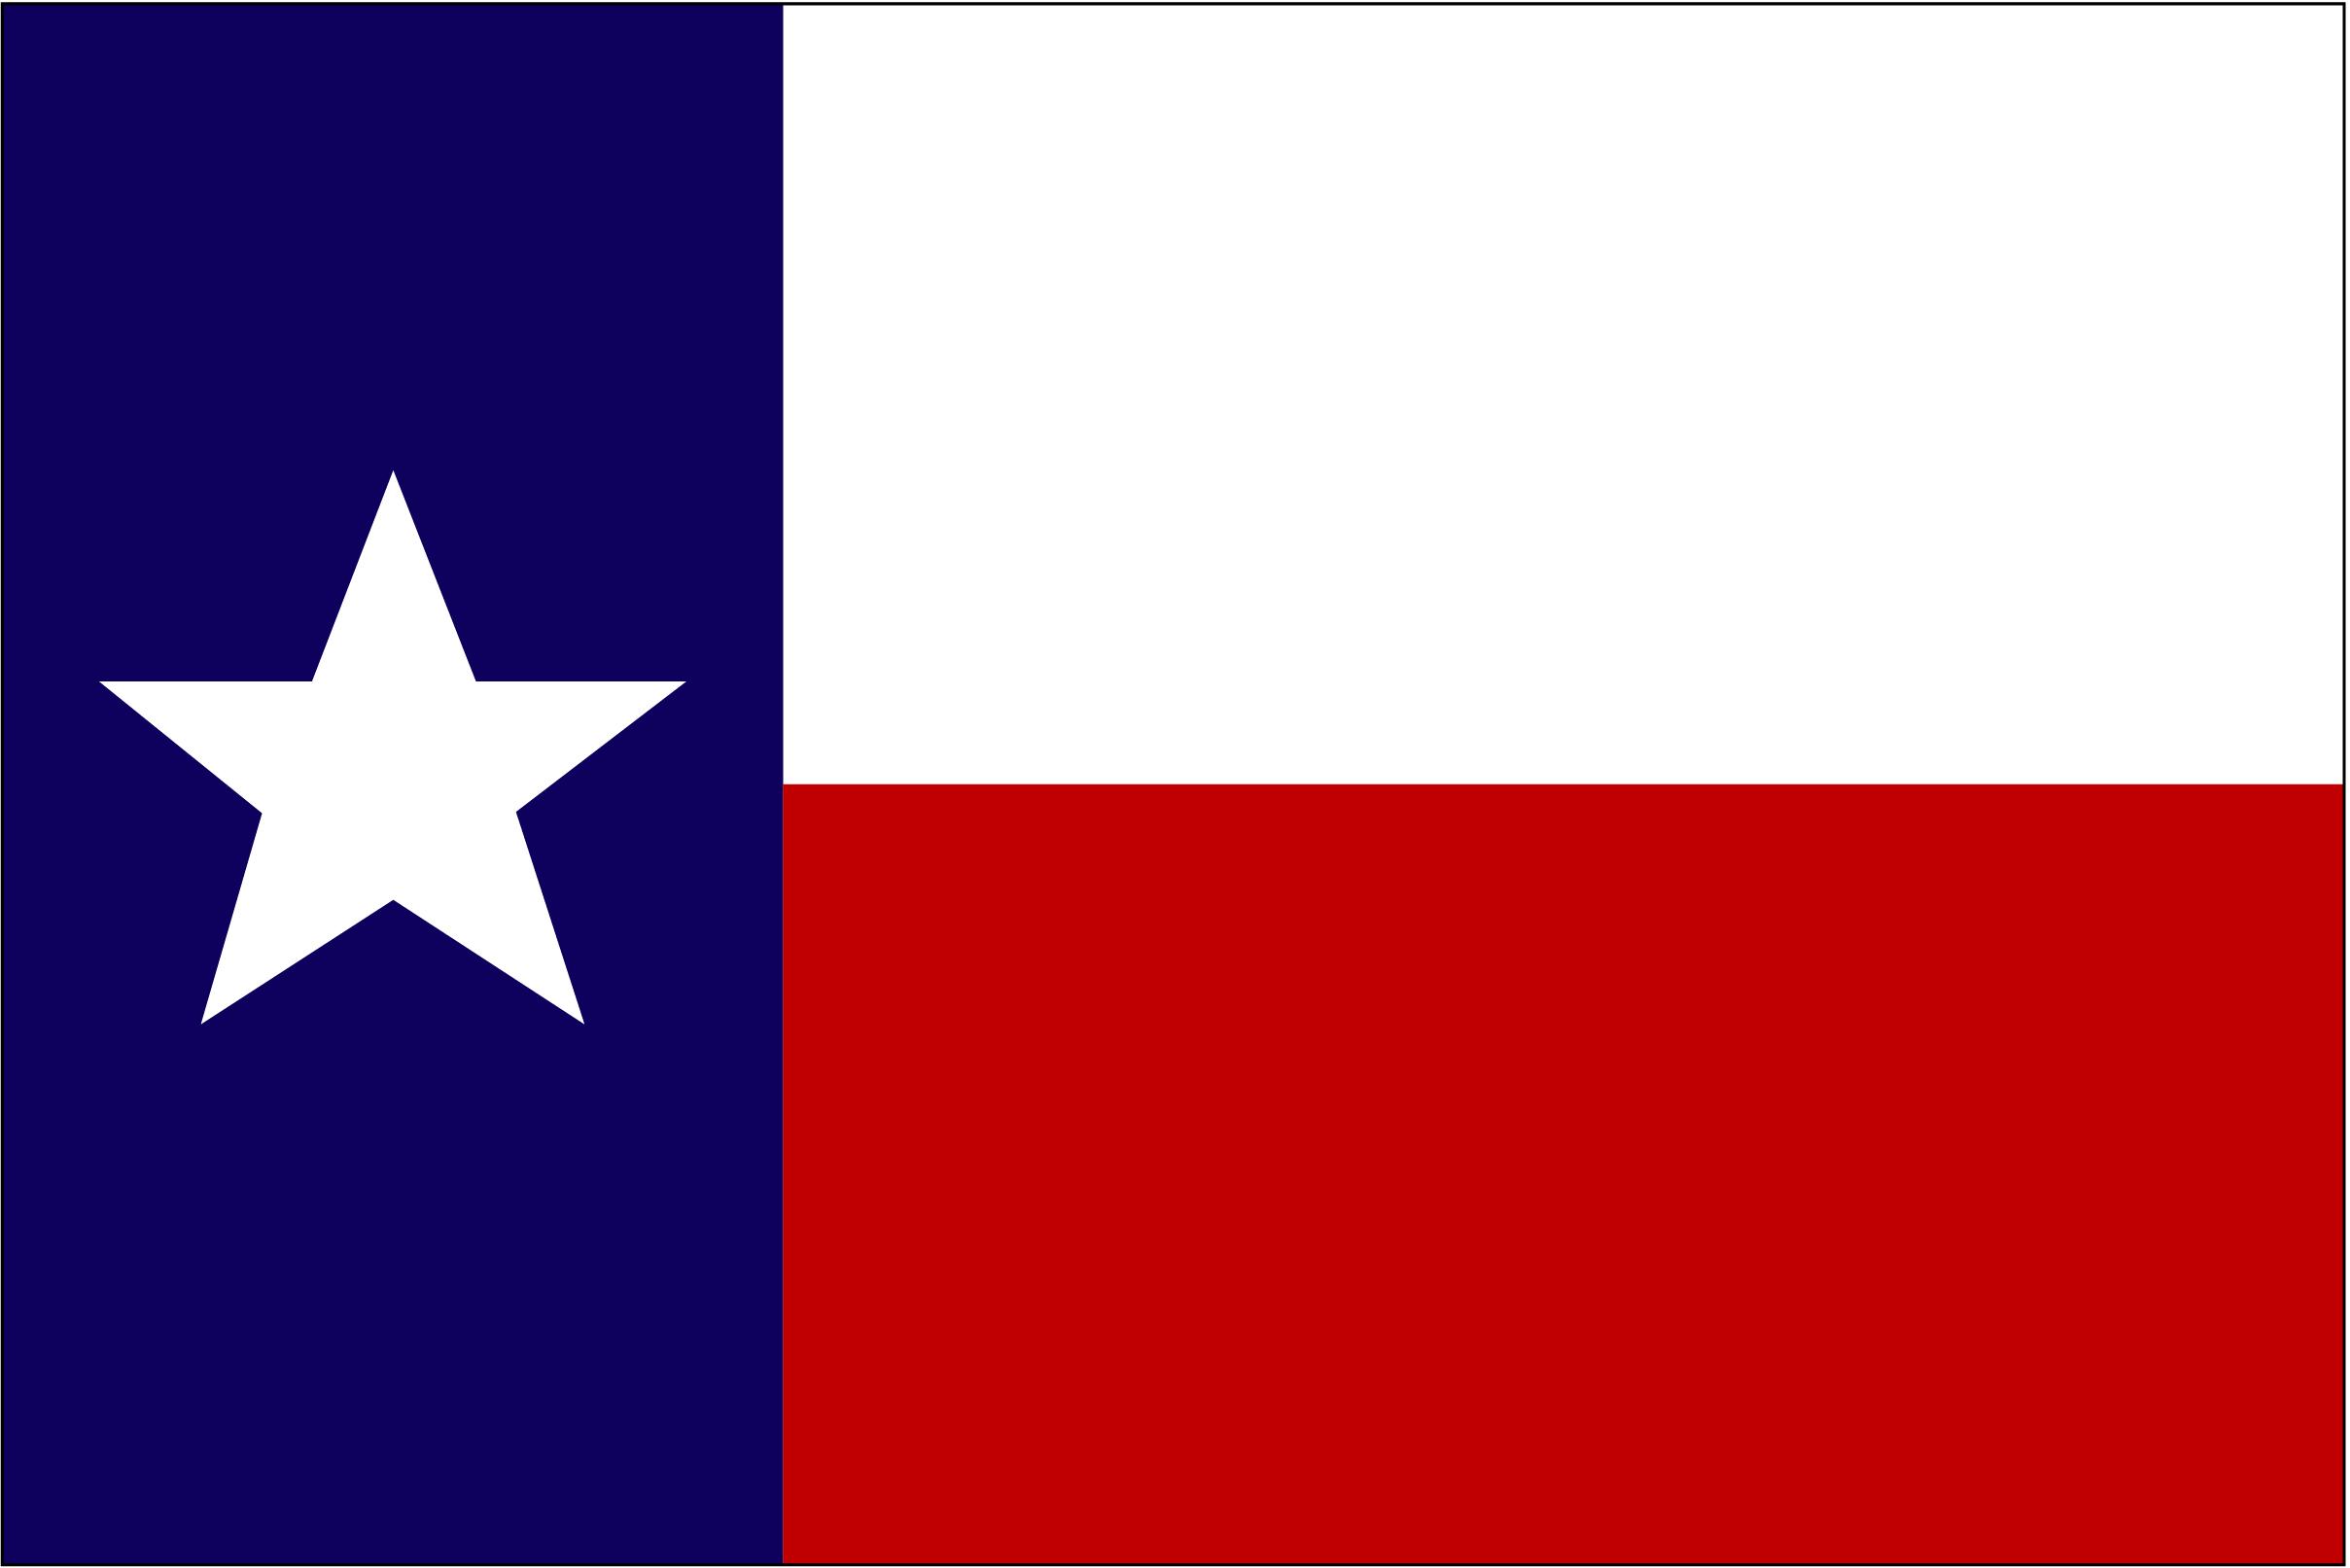 Texas Flag Image.